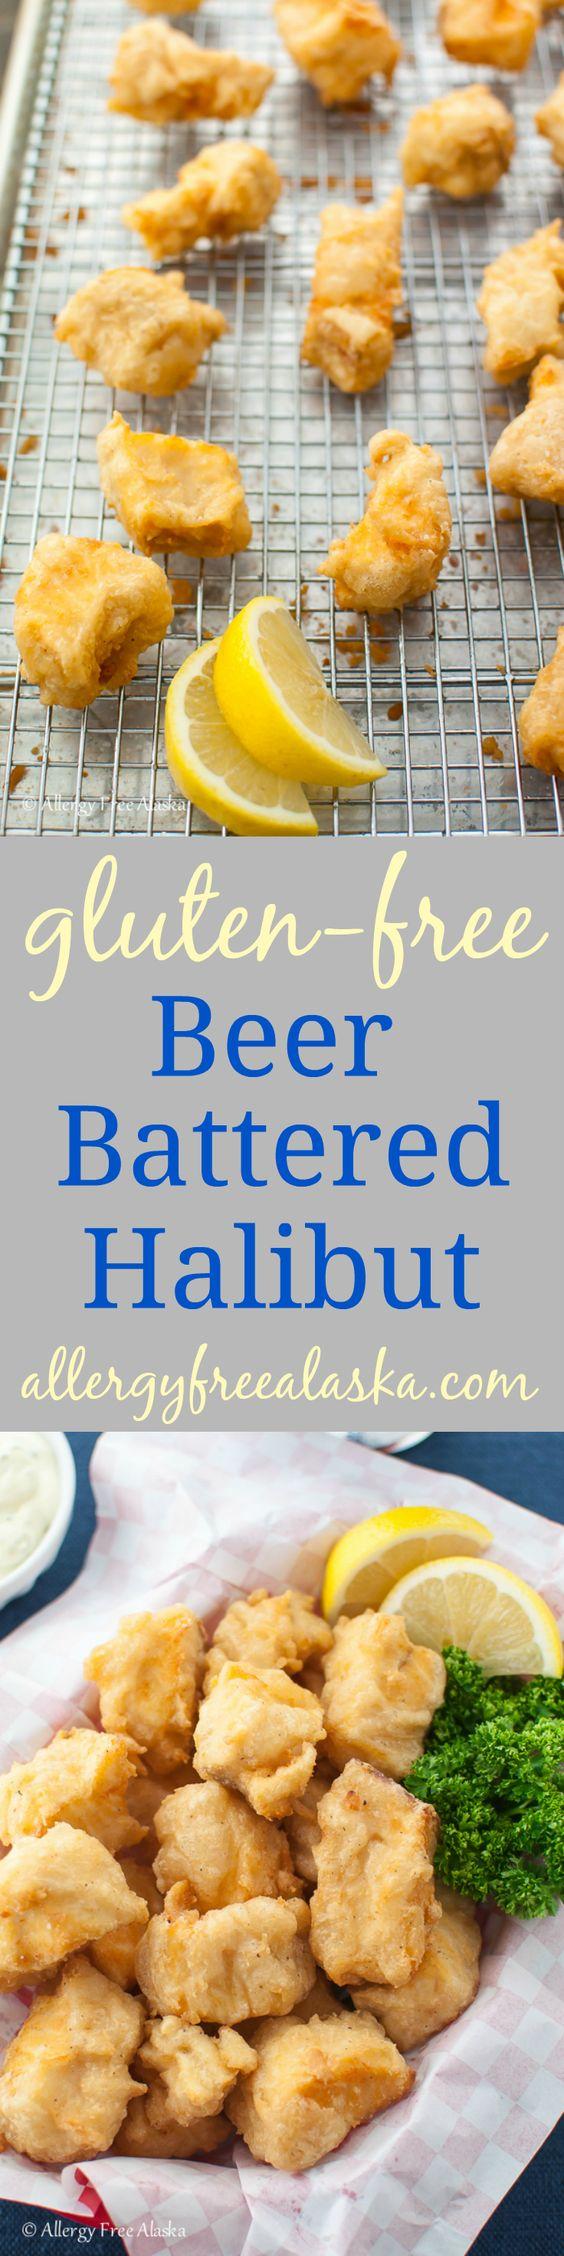 allergies fish batter alaska gluten free beer free beer gluten free ...